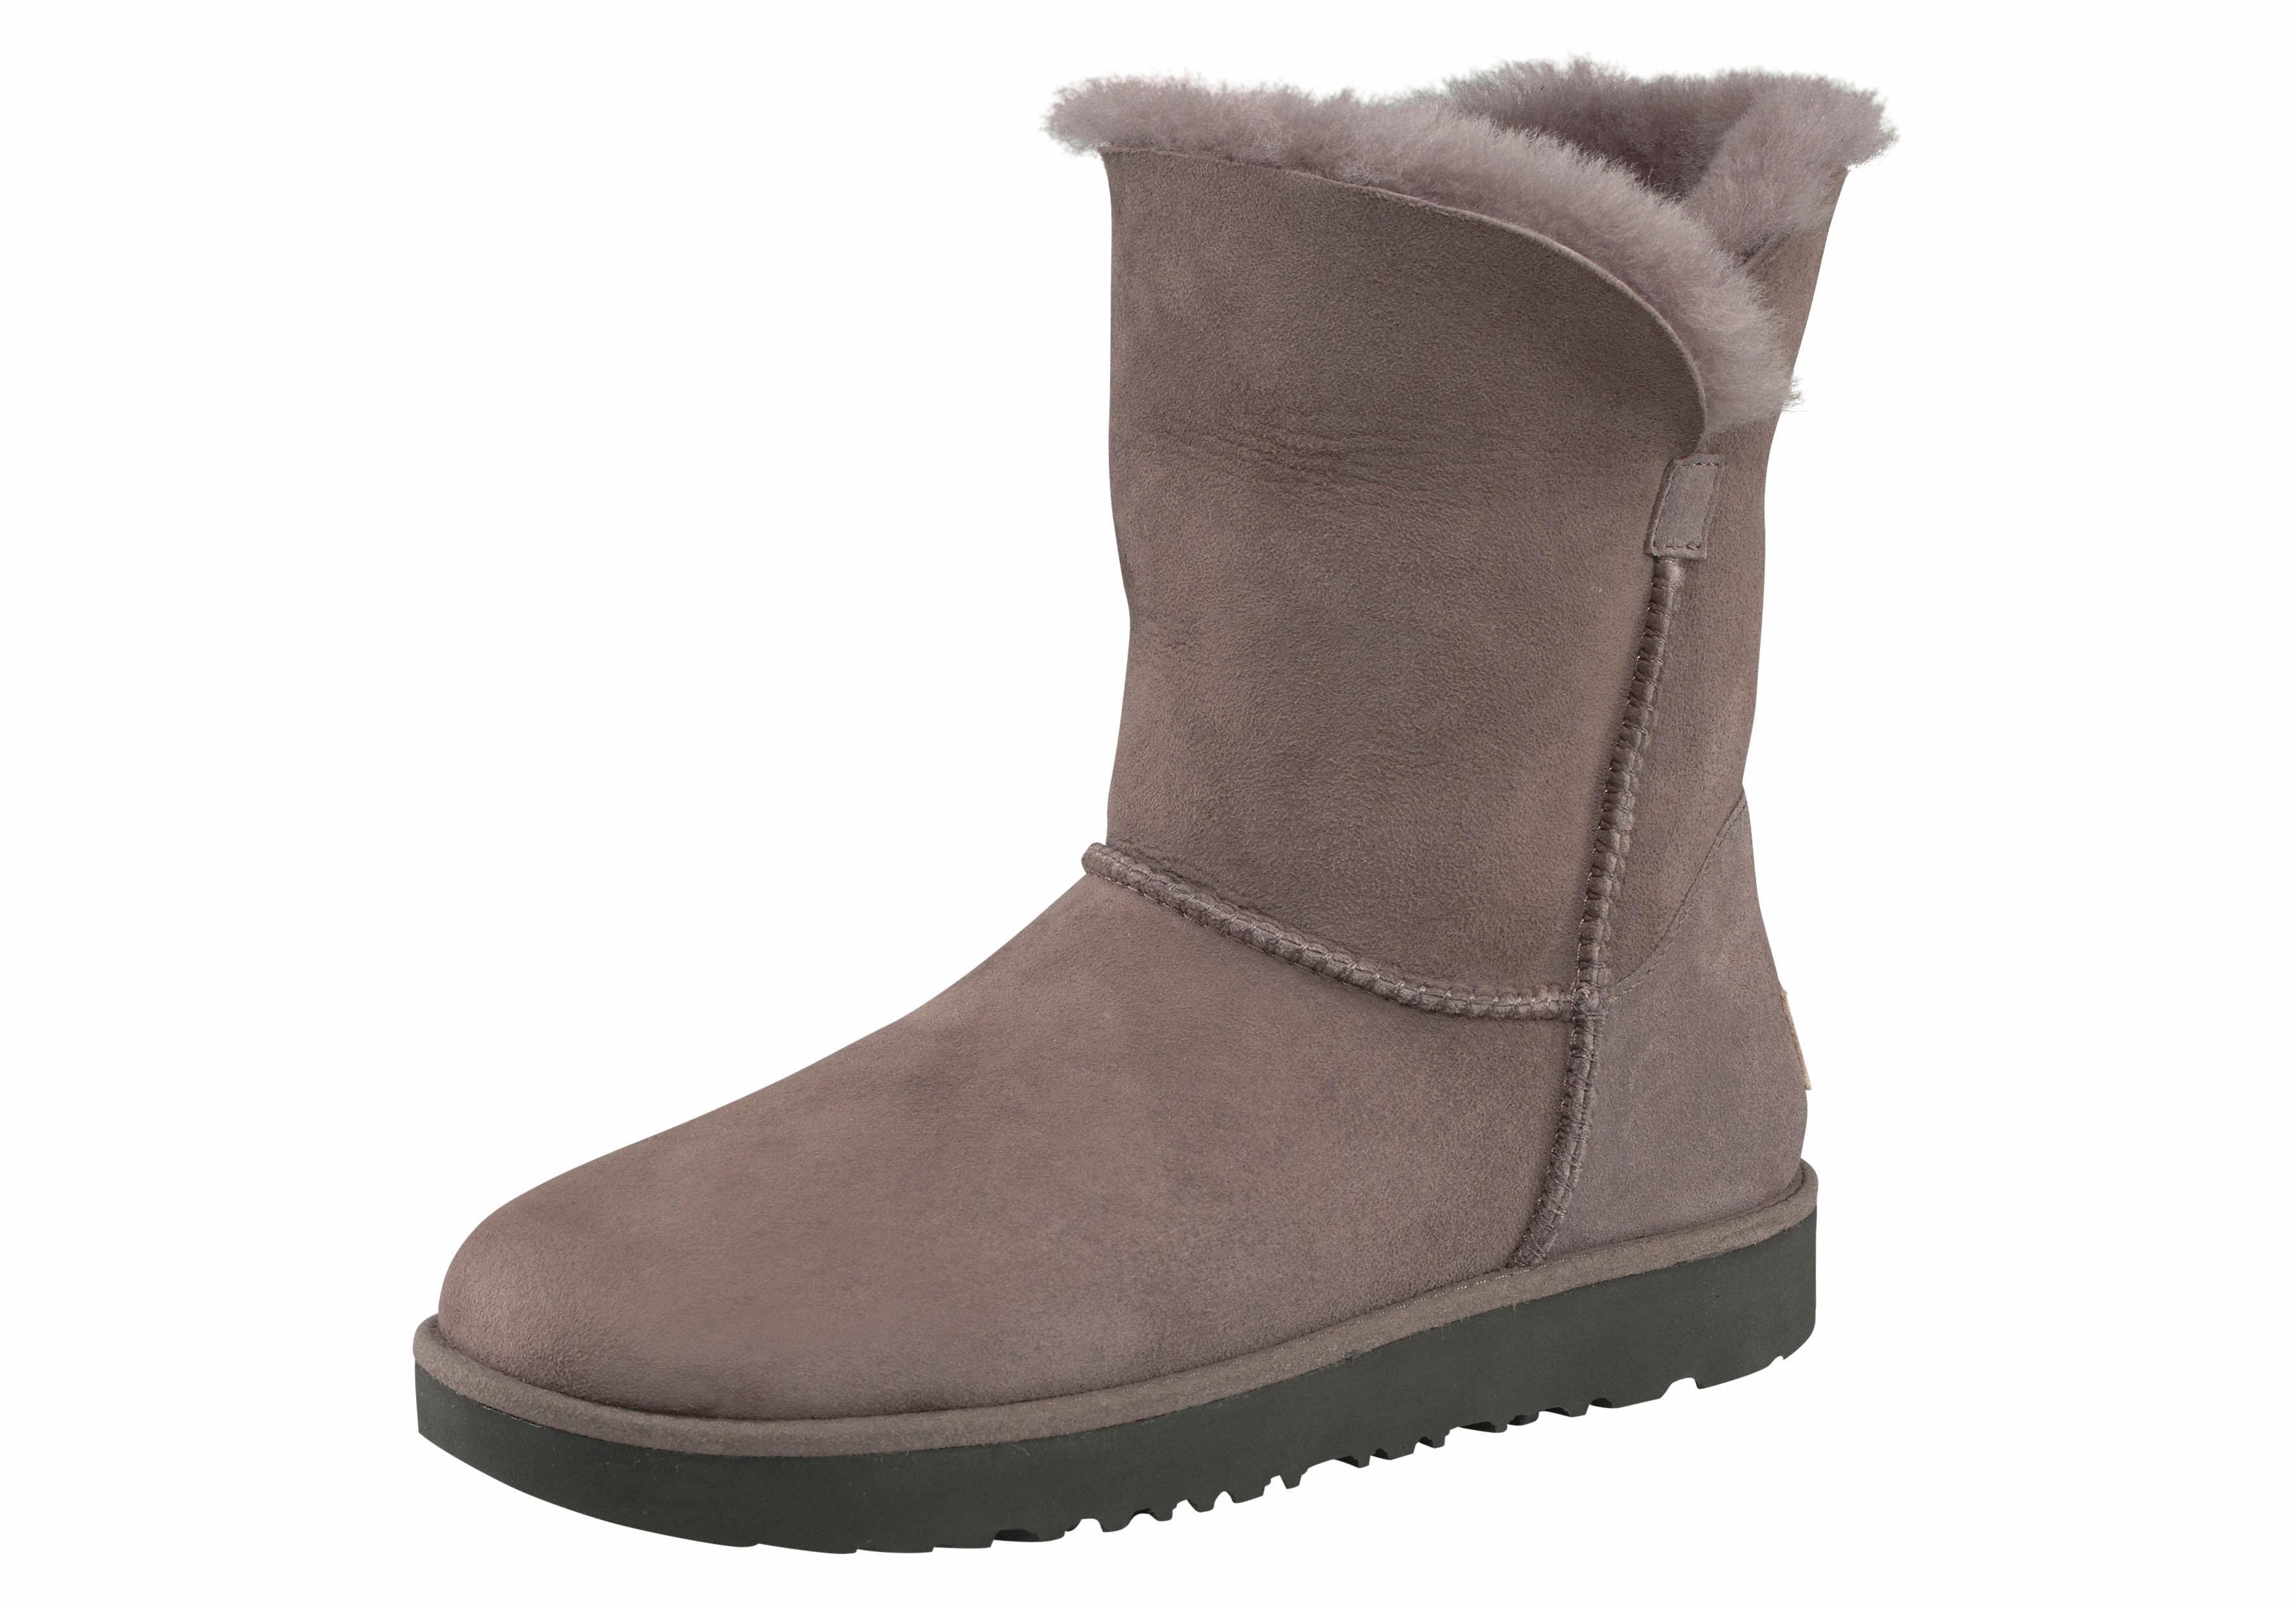 Ugg boots zonder sluiting »Classic Cuff Short« nu online bestellen